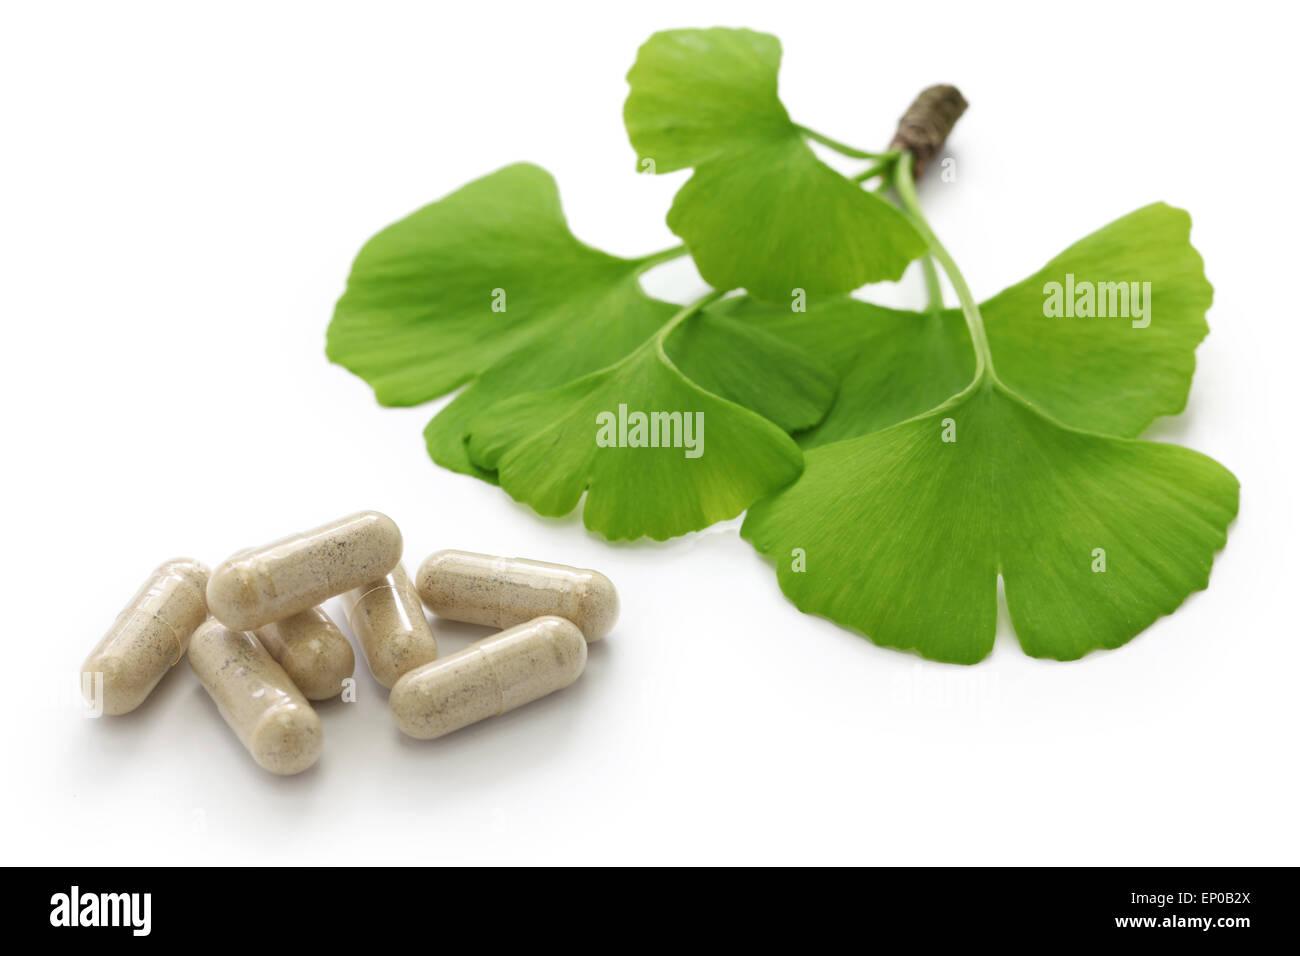 Ginkgo Biloba Blätter und Medizin Kapsel Pillen Stockbild